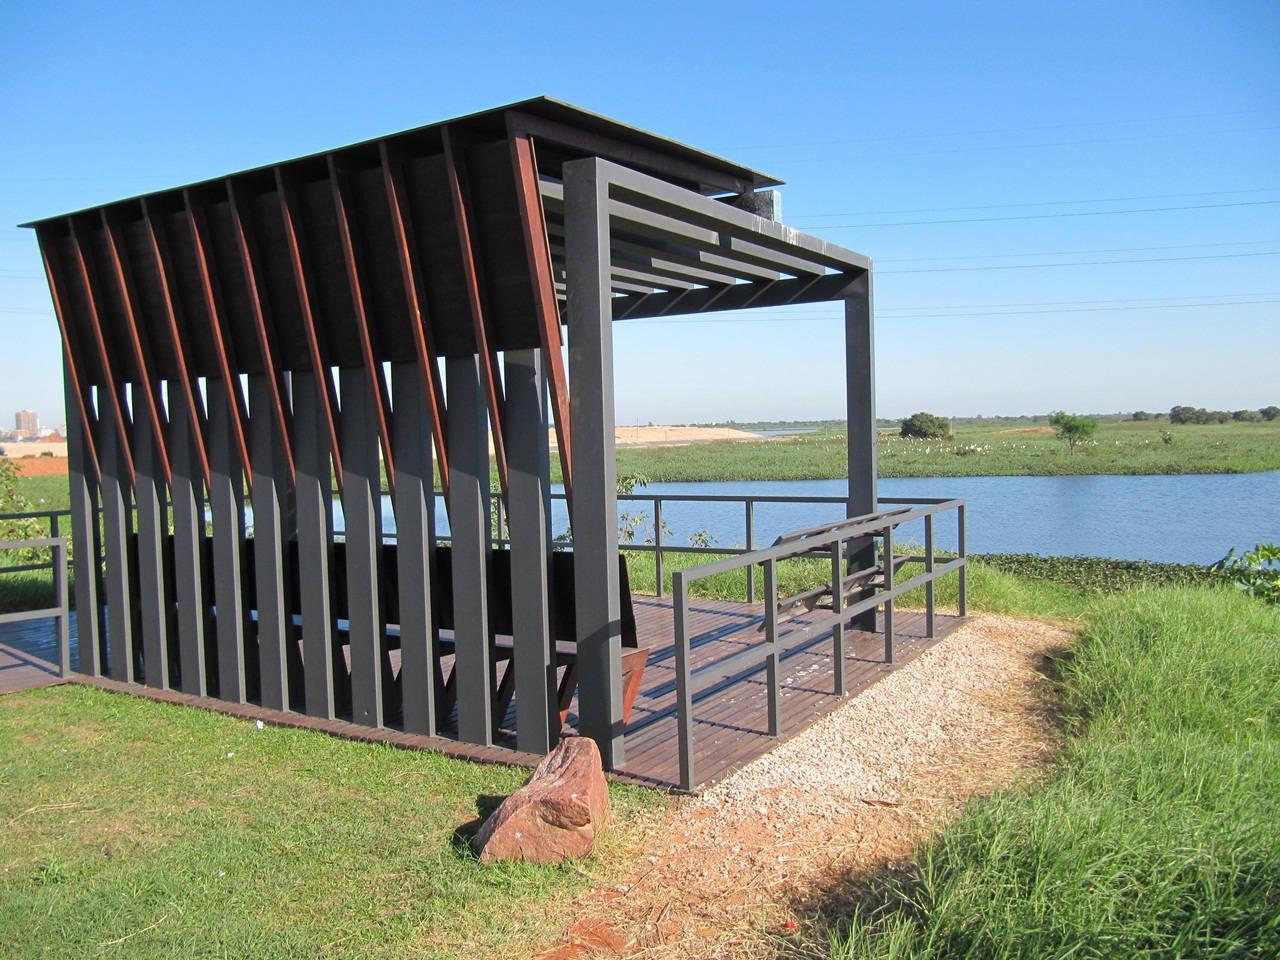 Observatório de Aves / Pedro Barrail + Marcelo Barrail + Lourdes Mendez, Cortesia arquitetos